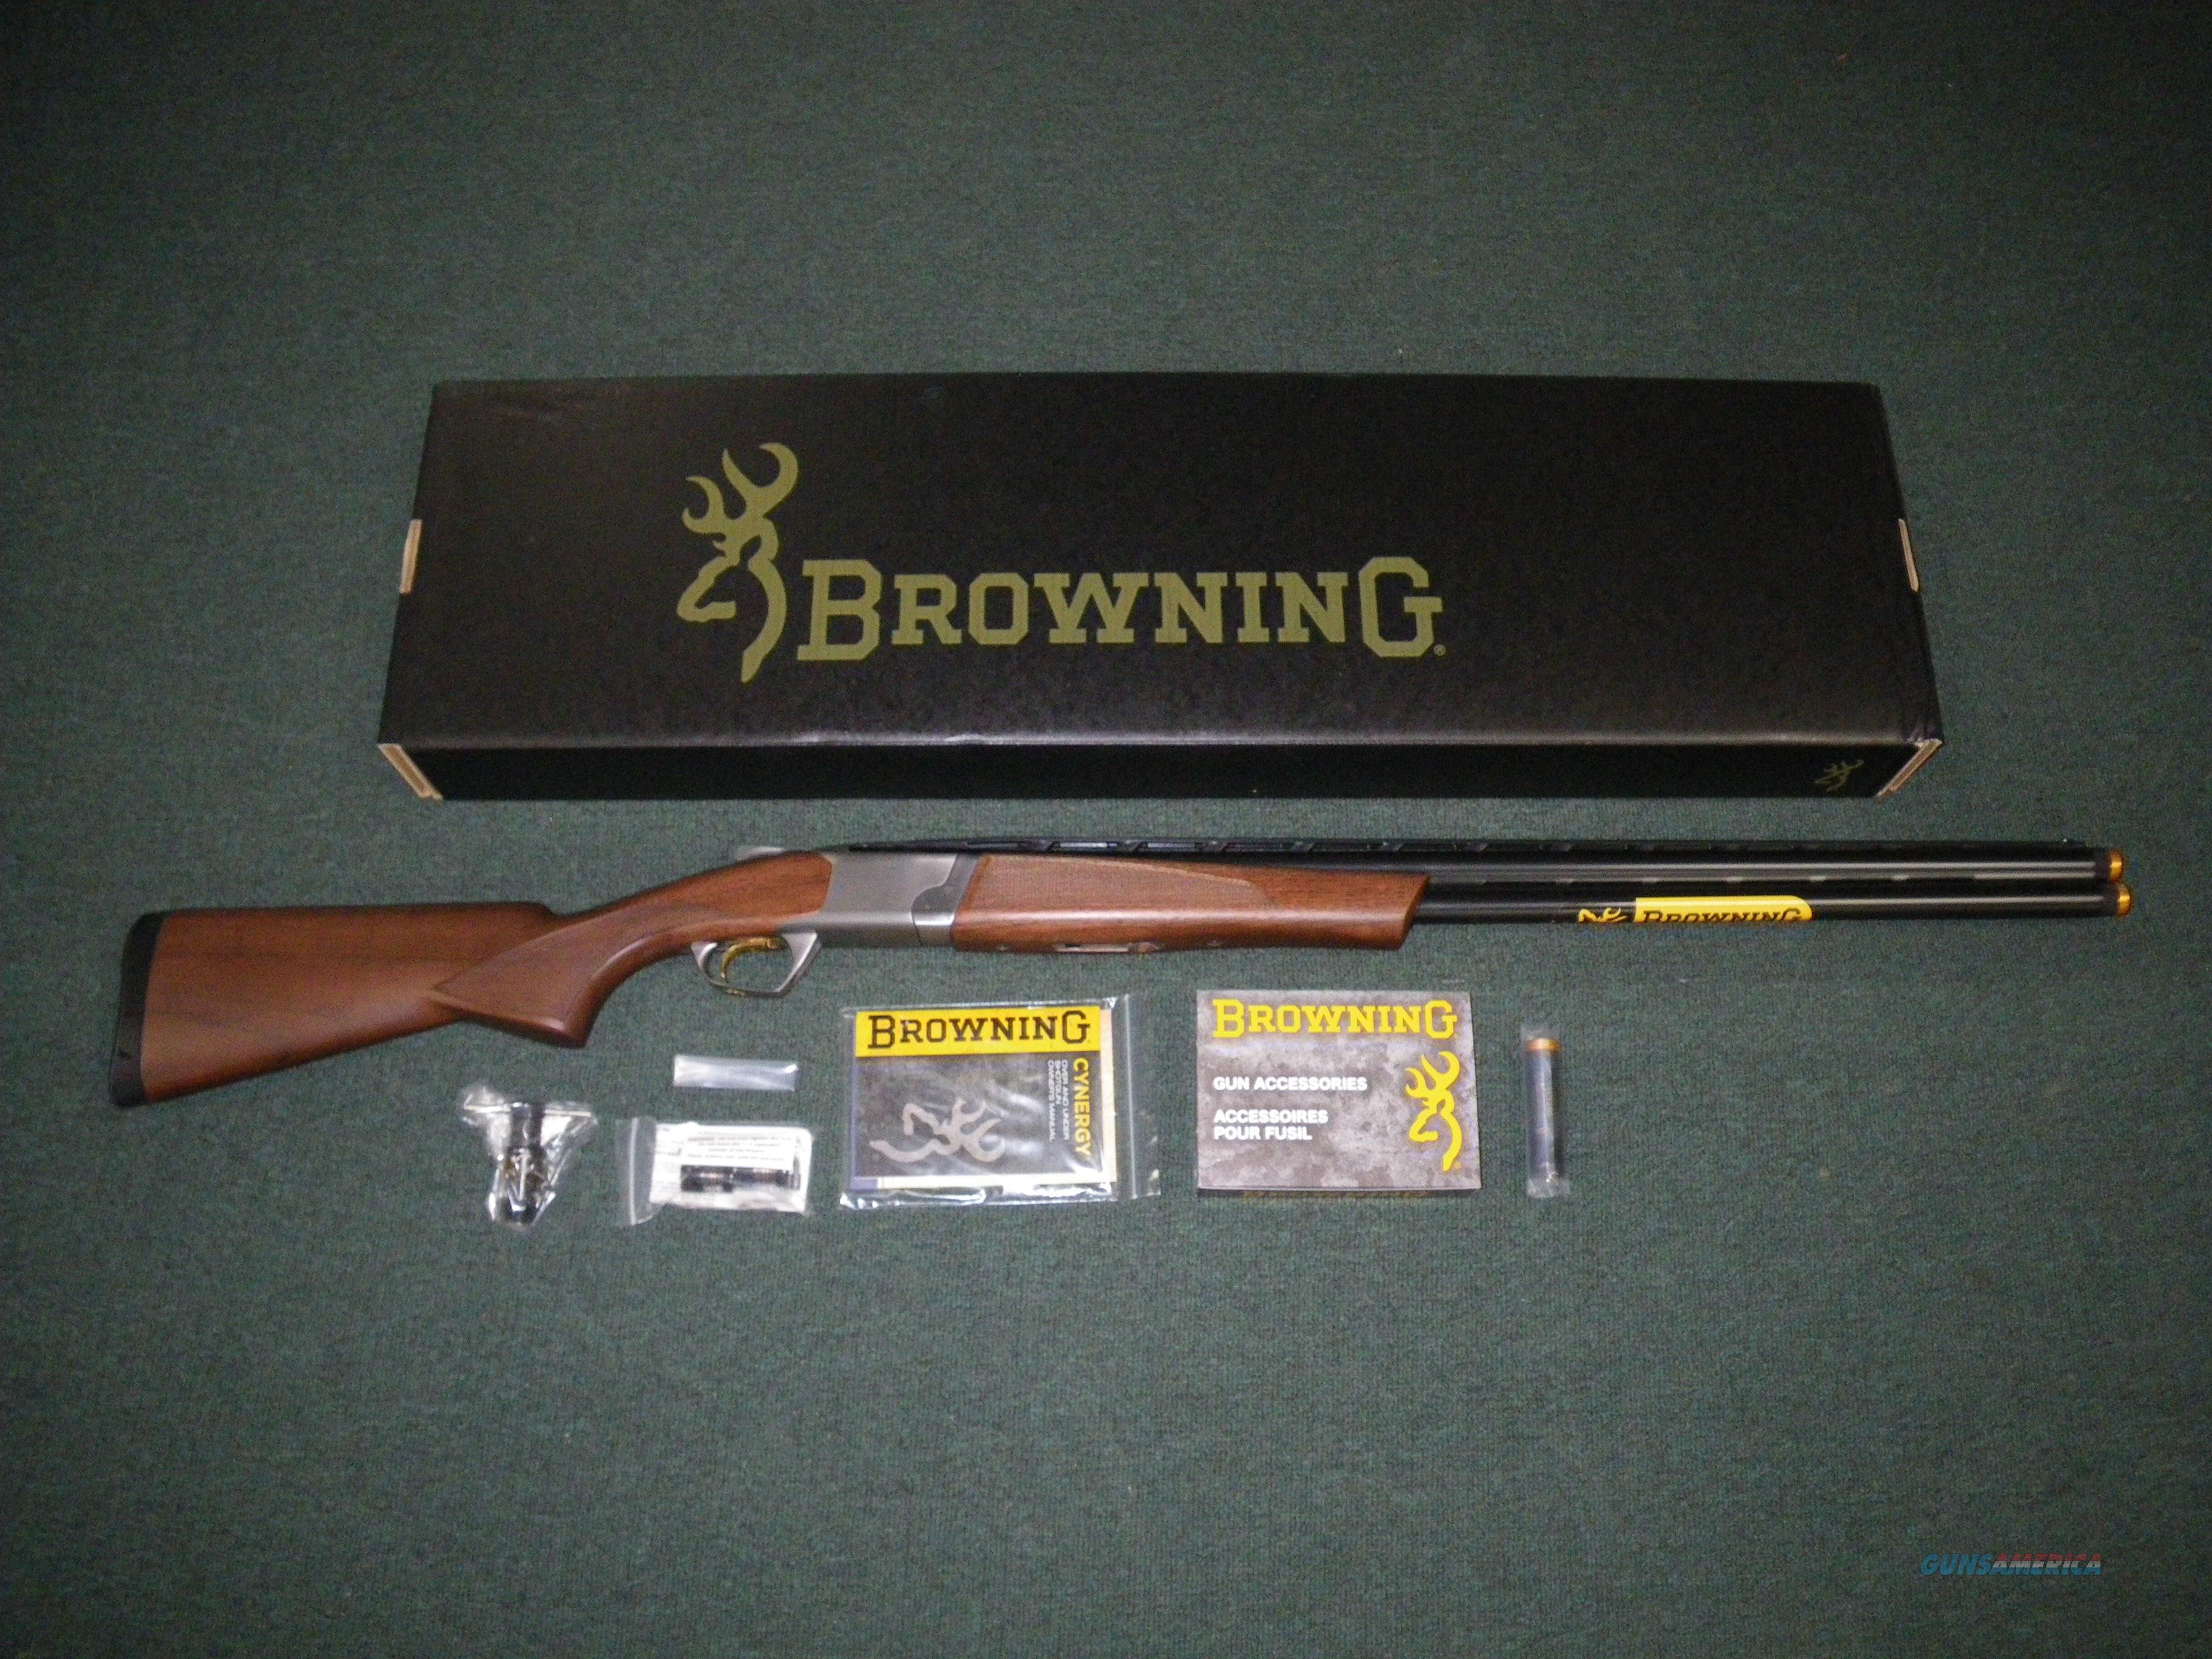 "Browning Cynergy CX 12ga 28"" NEW 3"" Chamber #018709304  Guns > Shotguns > Browning Shotguns > Over Unders > Cynergy > Hunting"